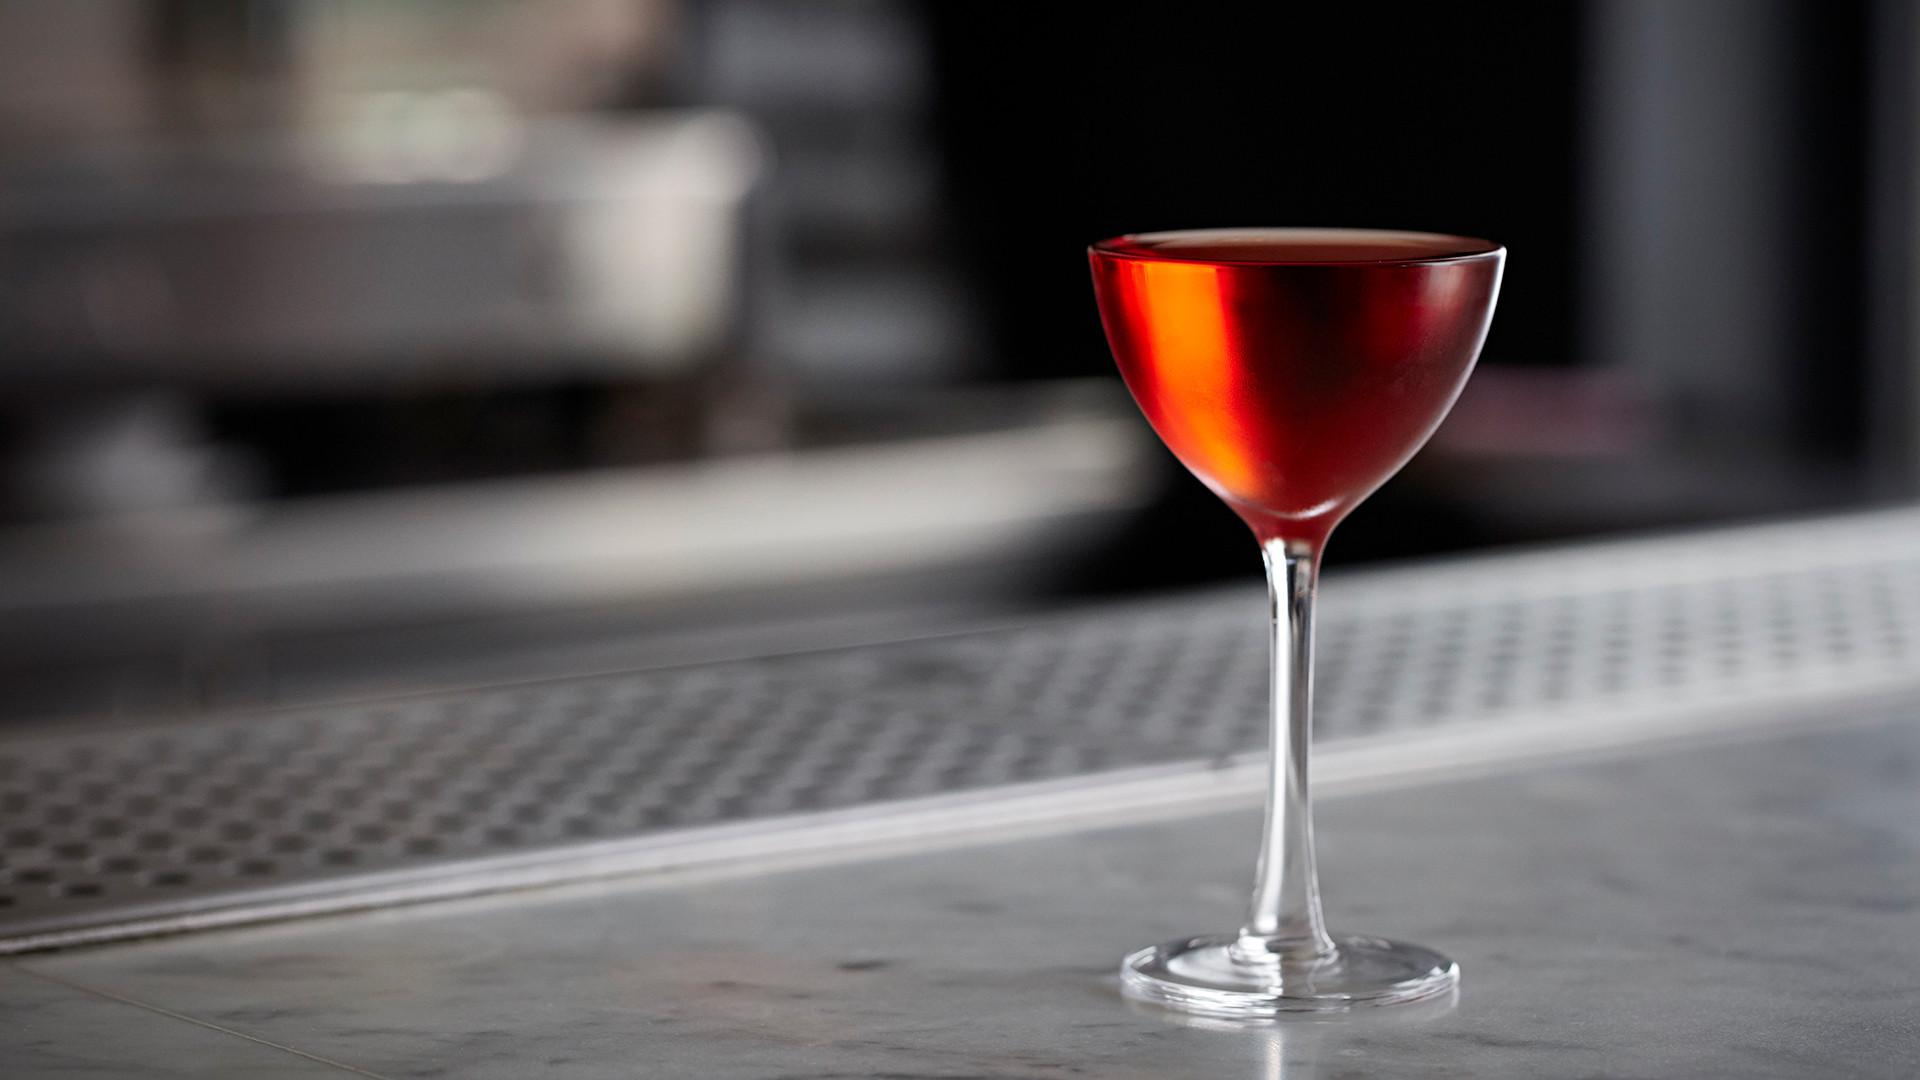 Classic negroni at Bar Termini